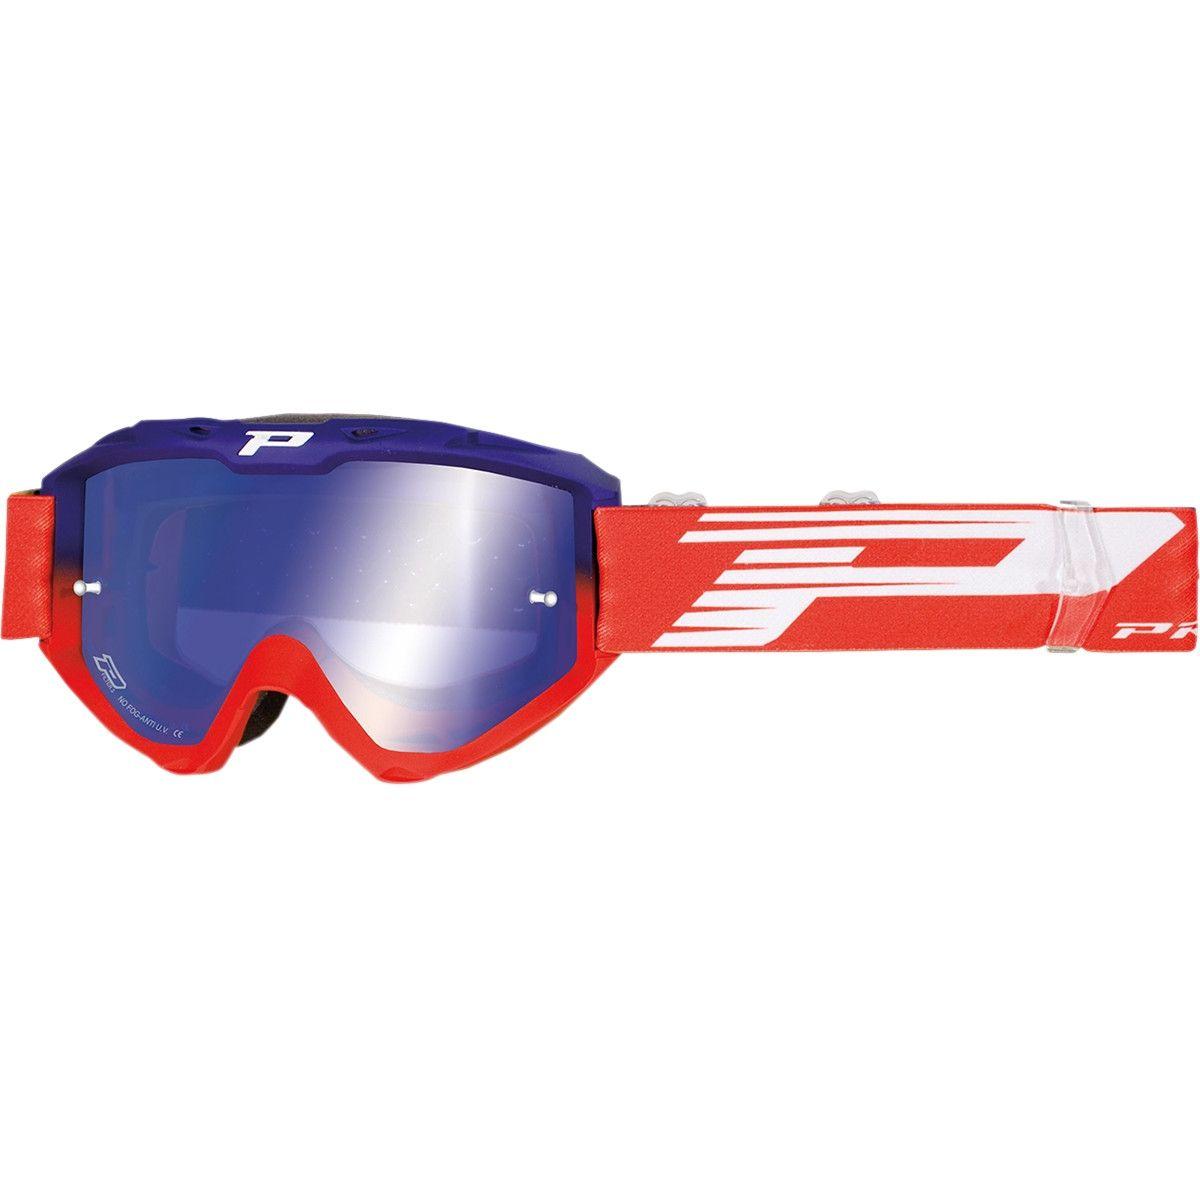 Progrip Crossbril 3450 Riot Mirror Blue/Red